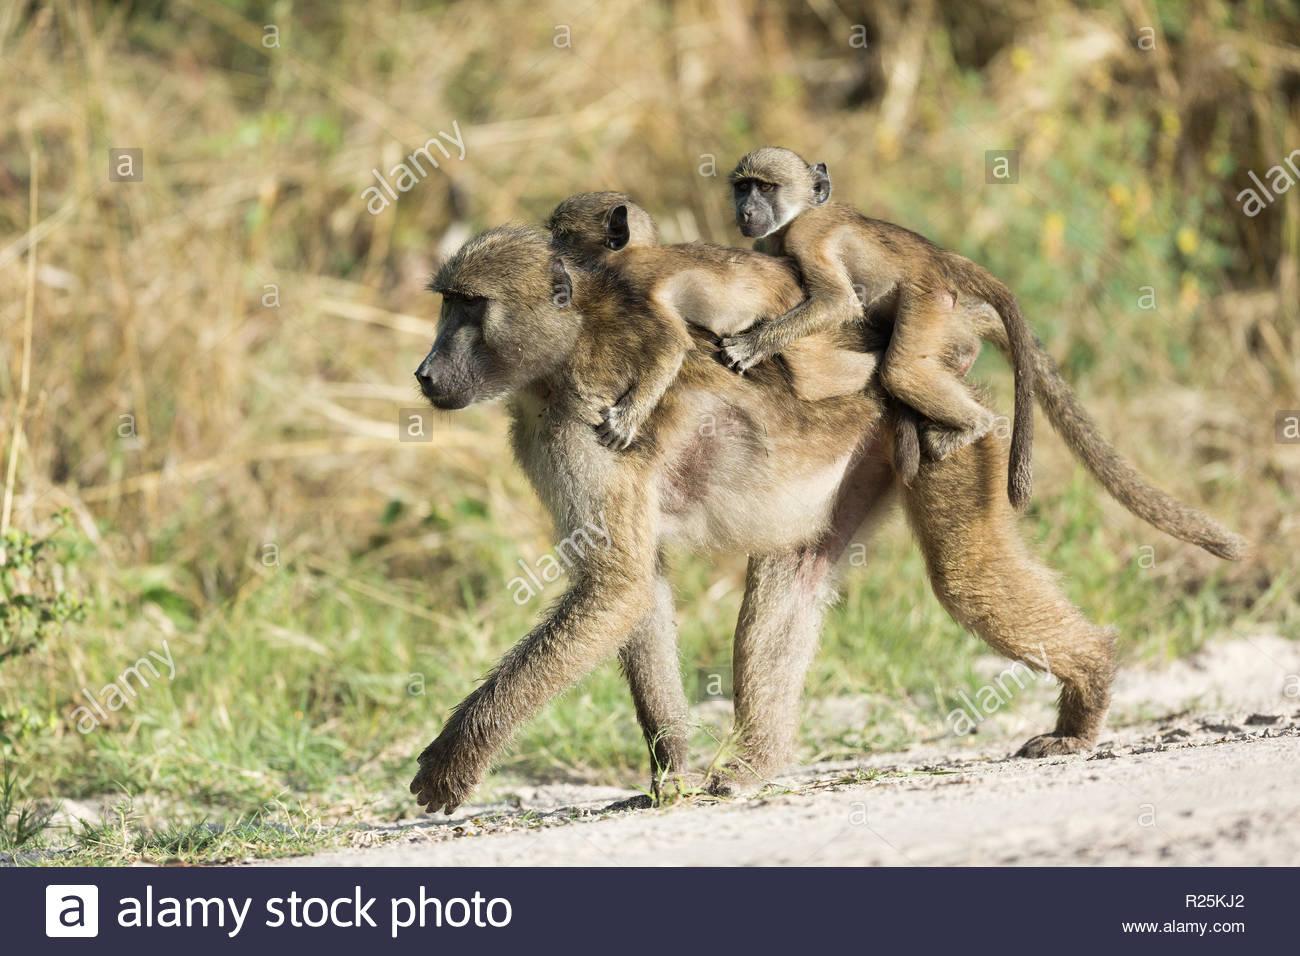 Baboon (Hamadryas papio) carrying twins, Khwai, Botswana, Africa - Stock Image